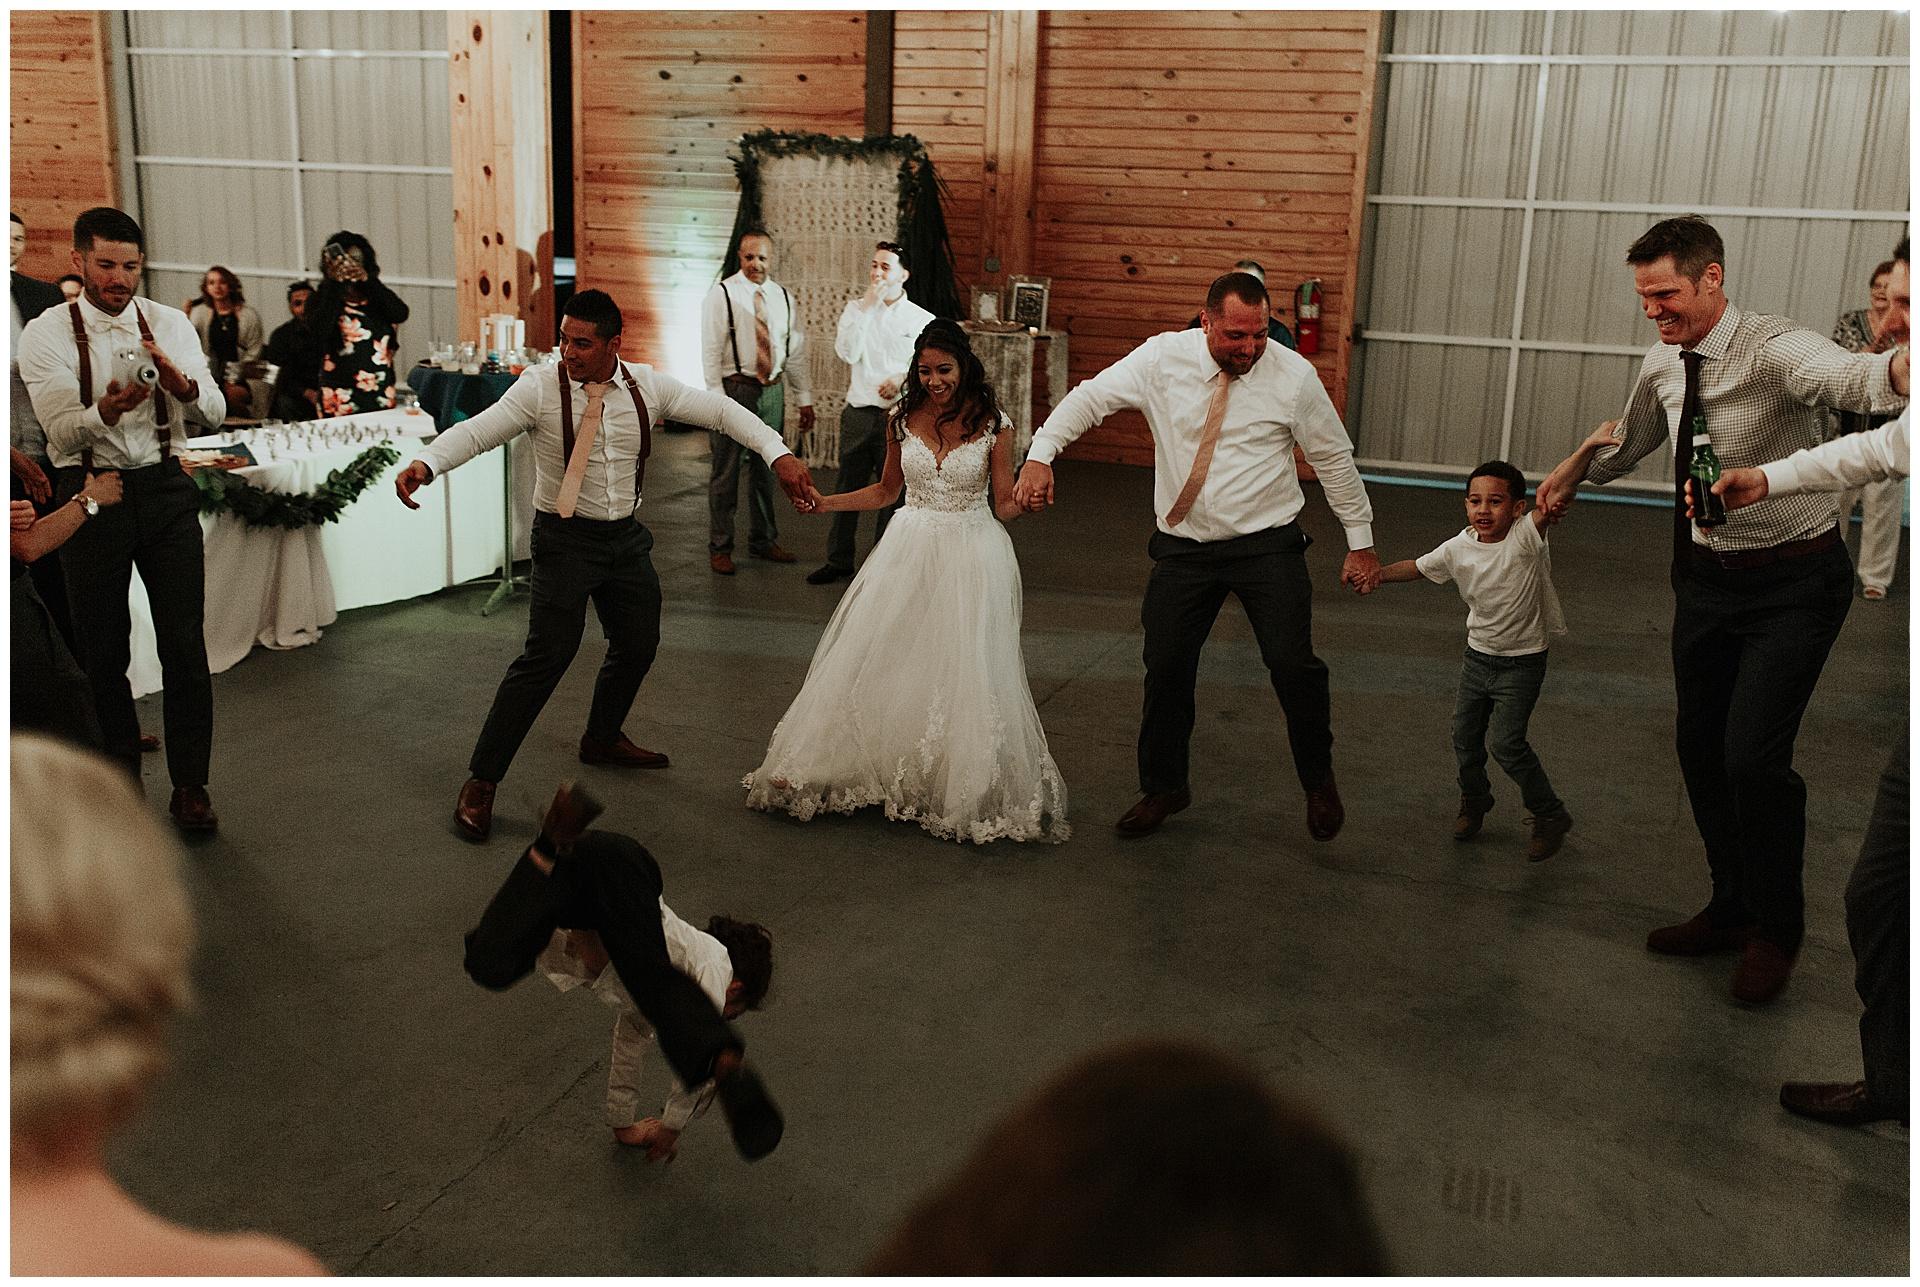 st augustine wedding photographer_mia dimare photography52.jpg